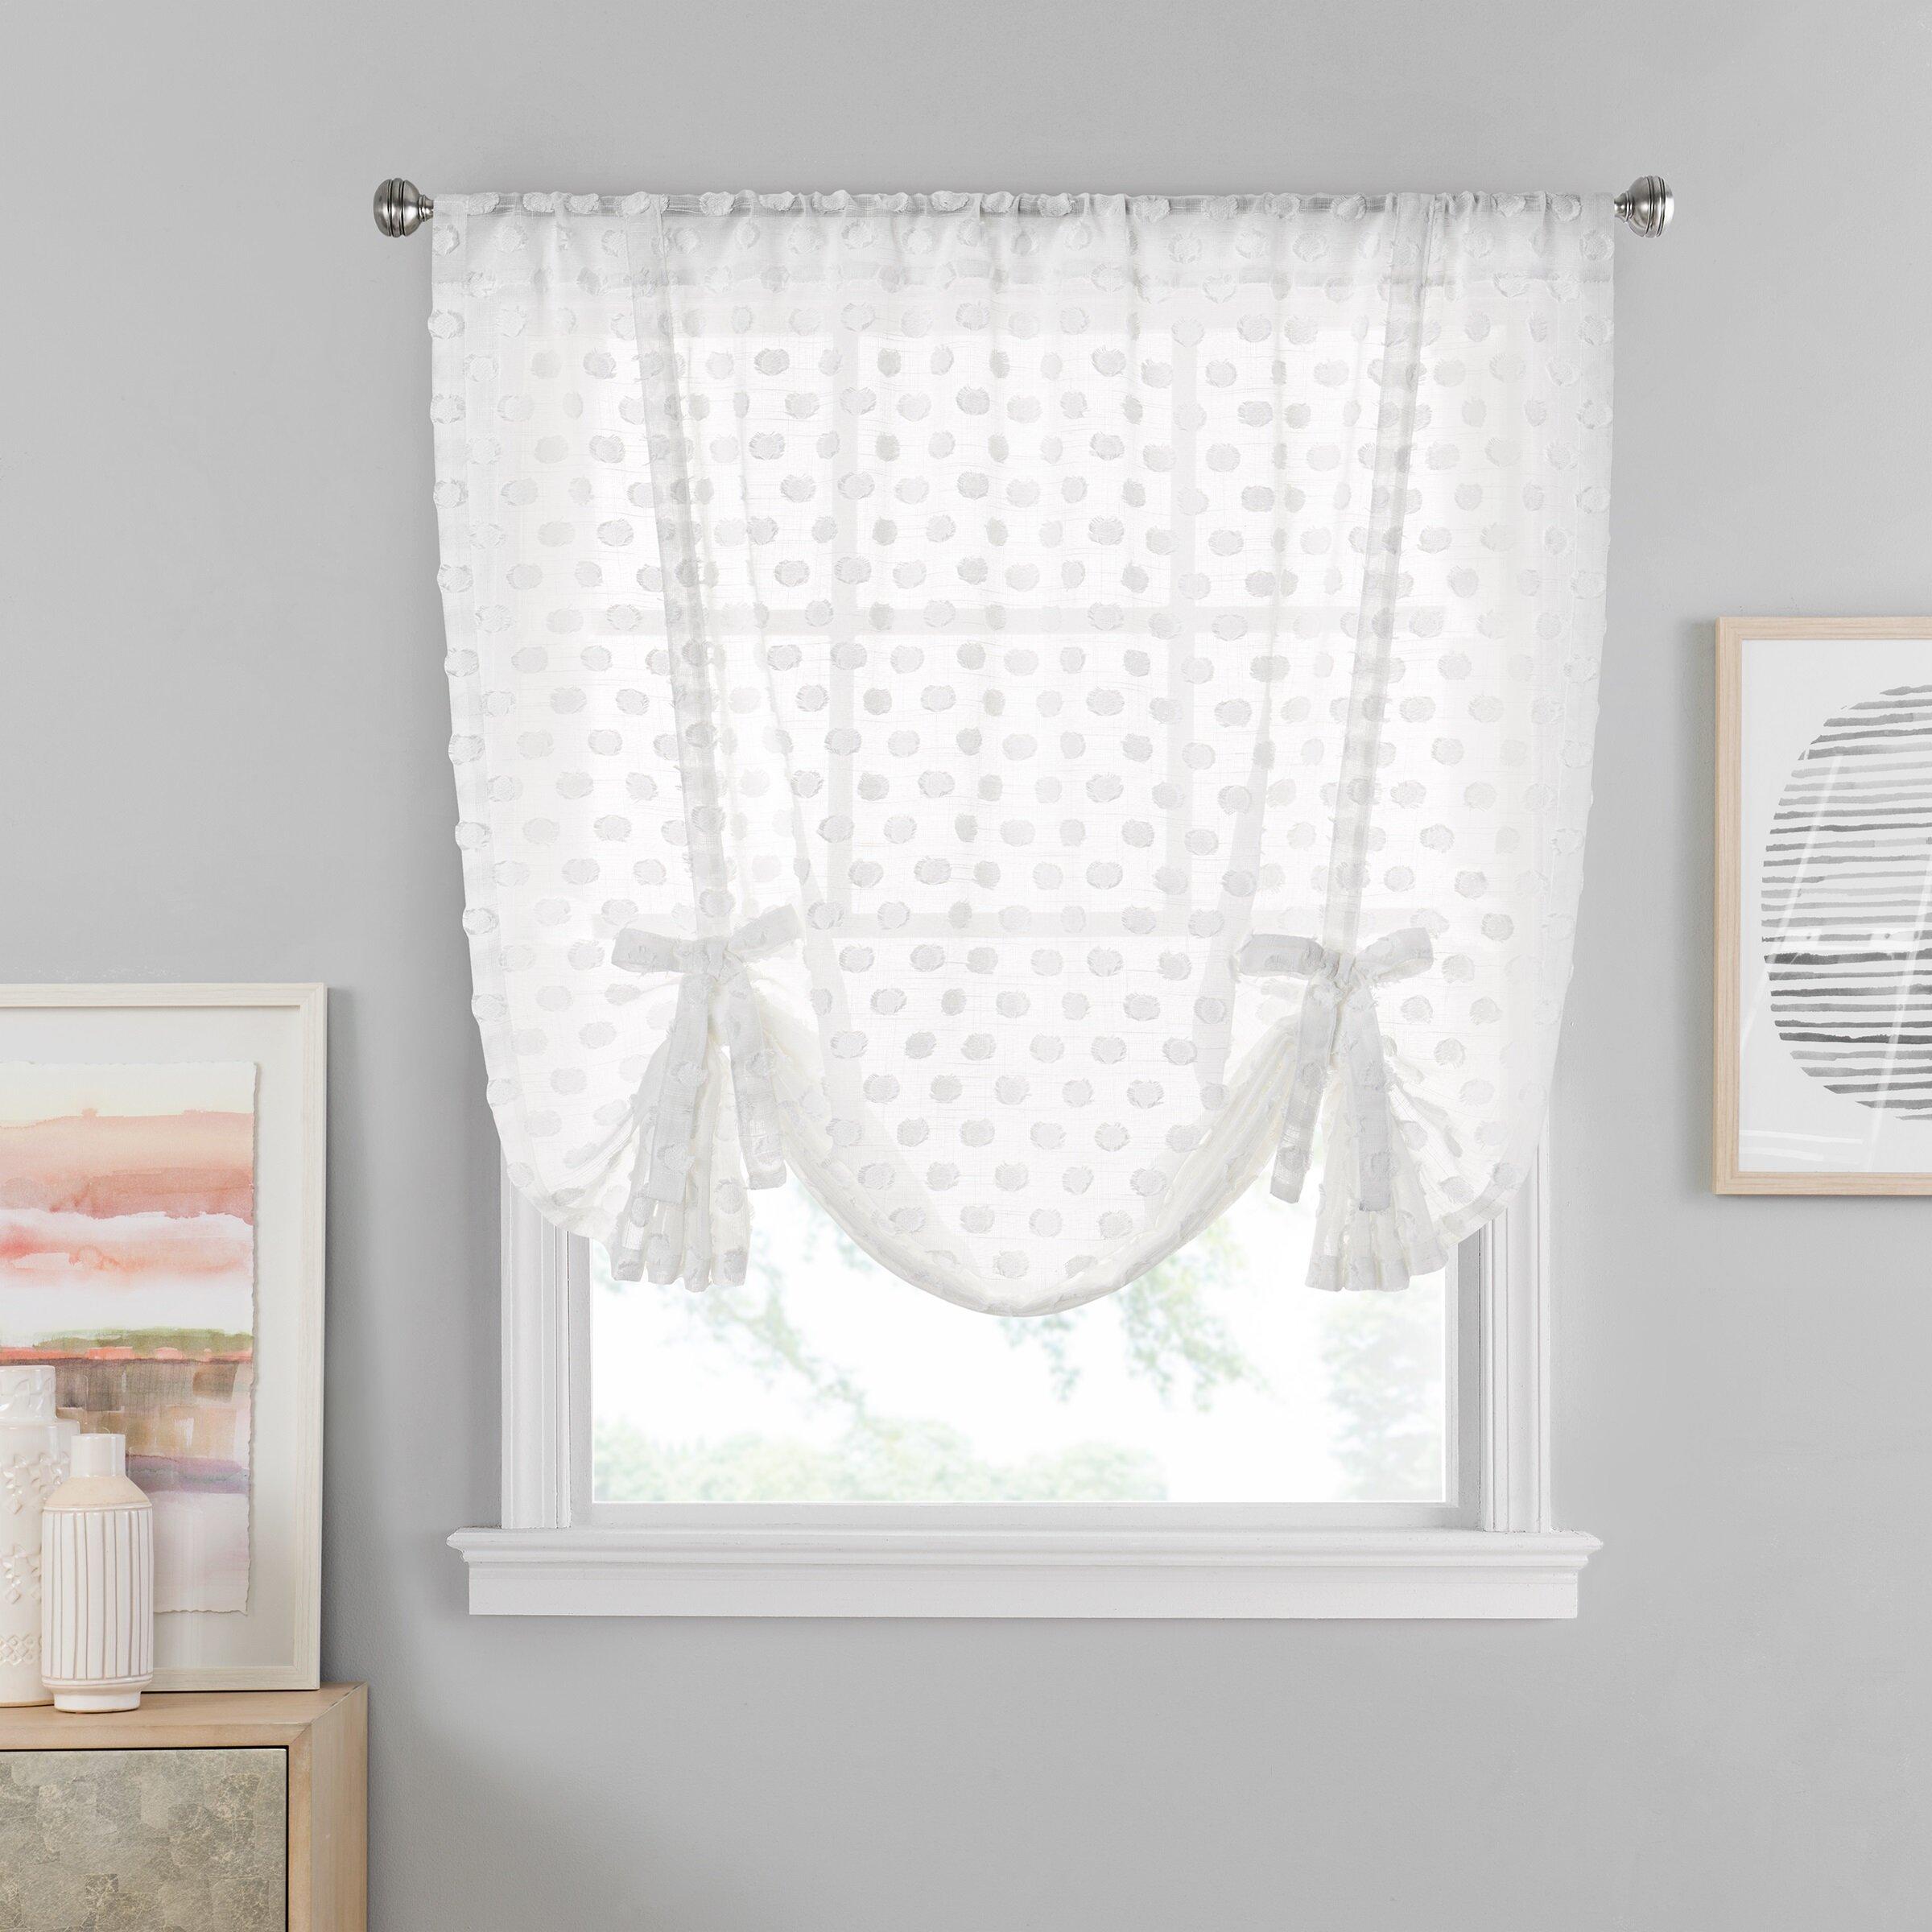 Gracie Oaks Vue Window Solutions Modo Sheer Tie Up Shade Reviews Wayfair